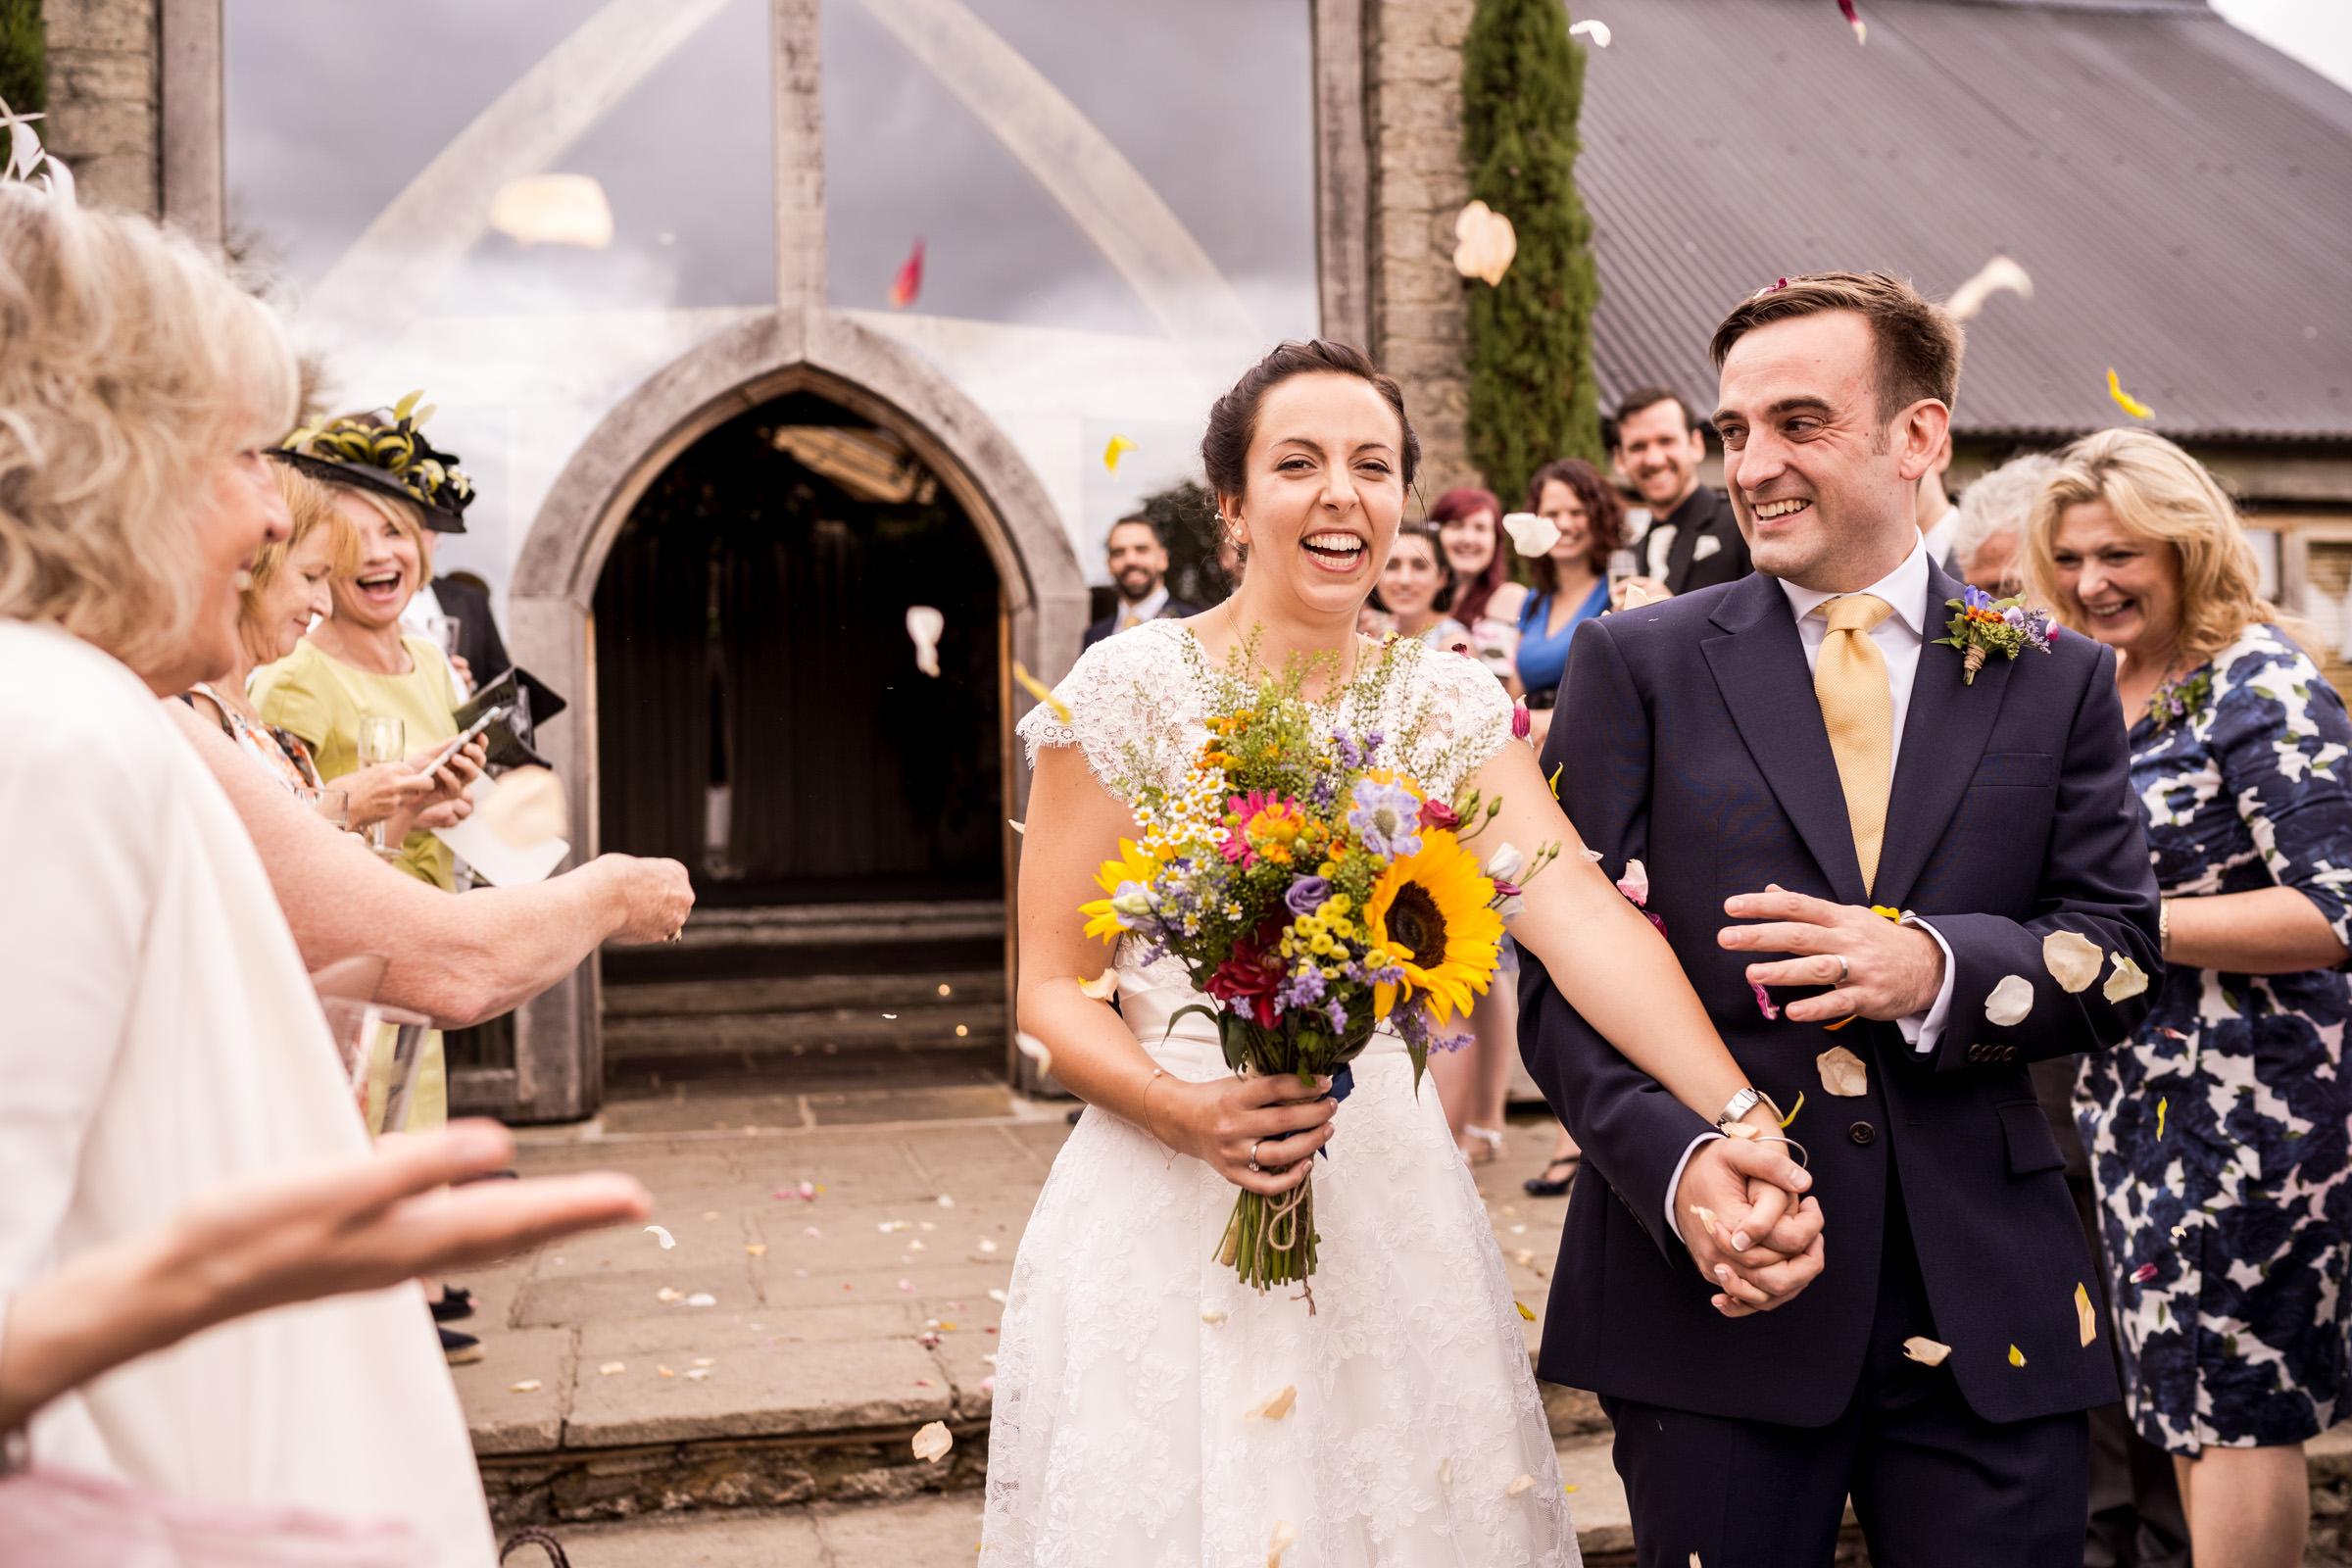 Cripps Barn Bibury Cotswolds Wedding Photography 016.jpg